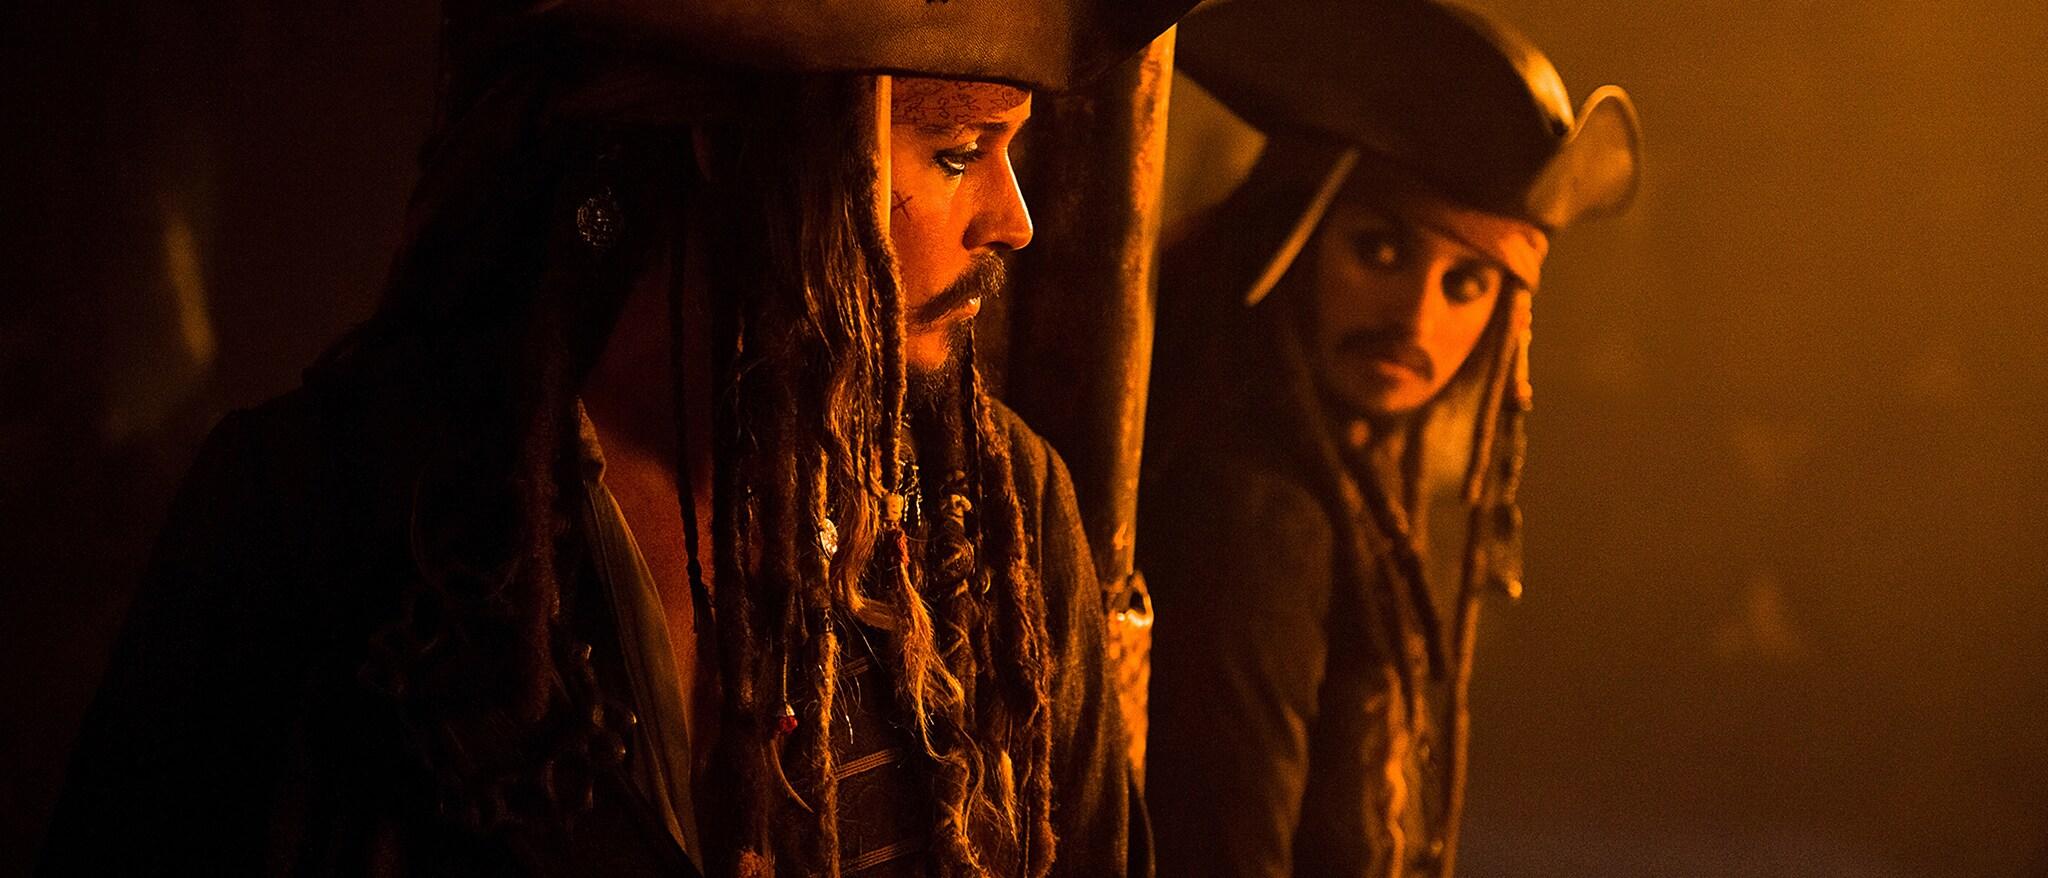 Pirates of the Caribbean: On Stranger Tides Hero